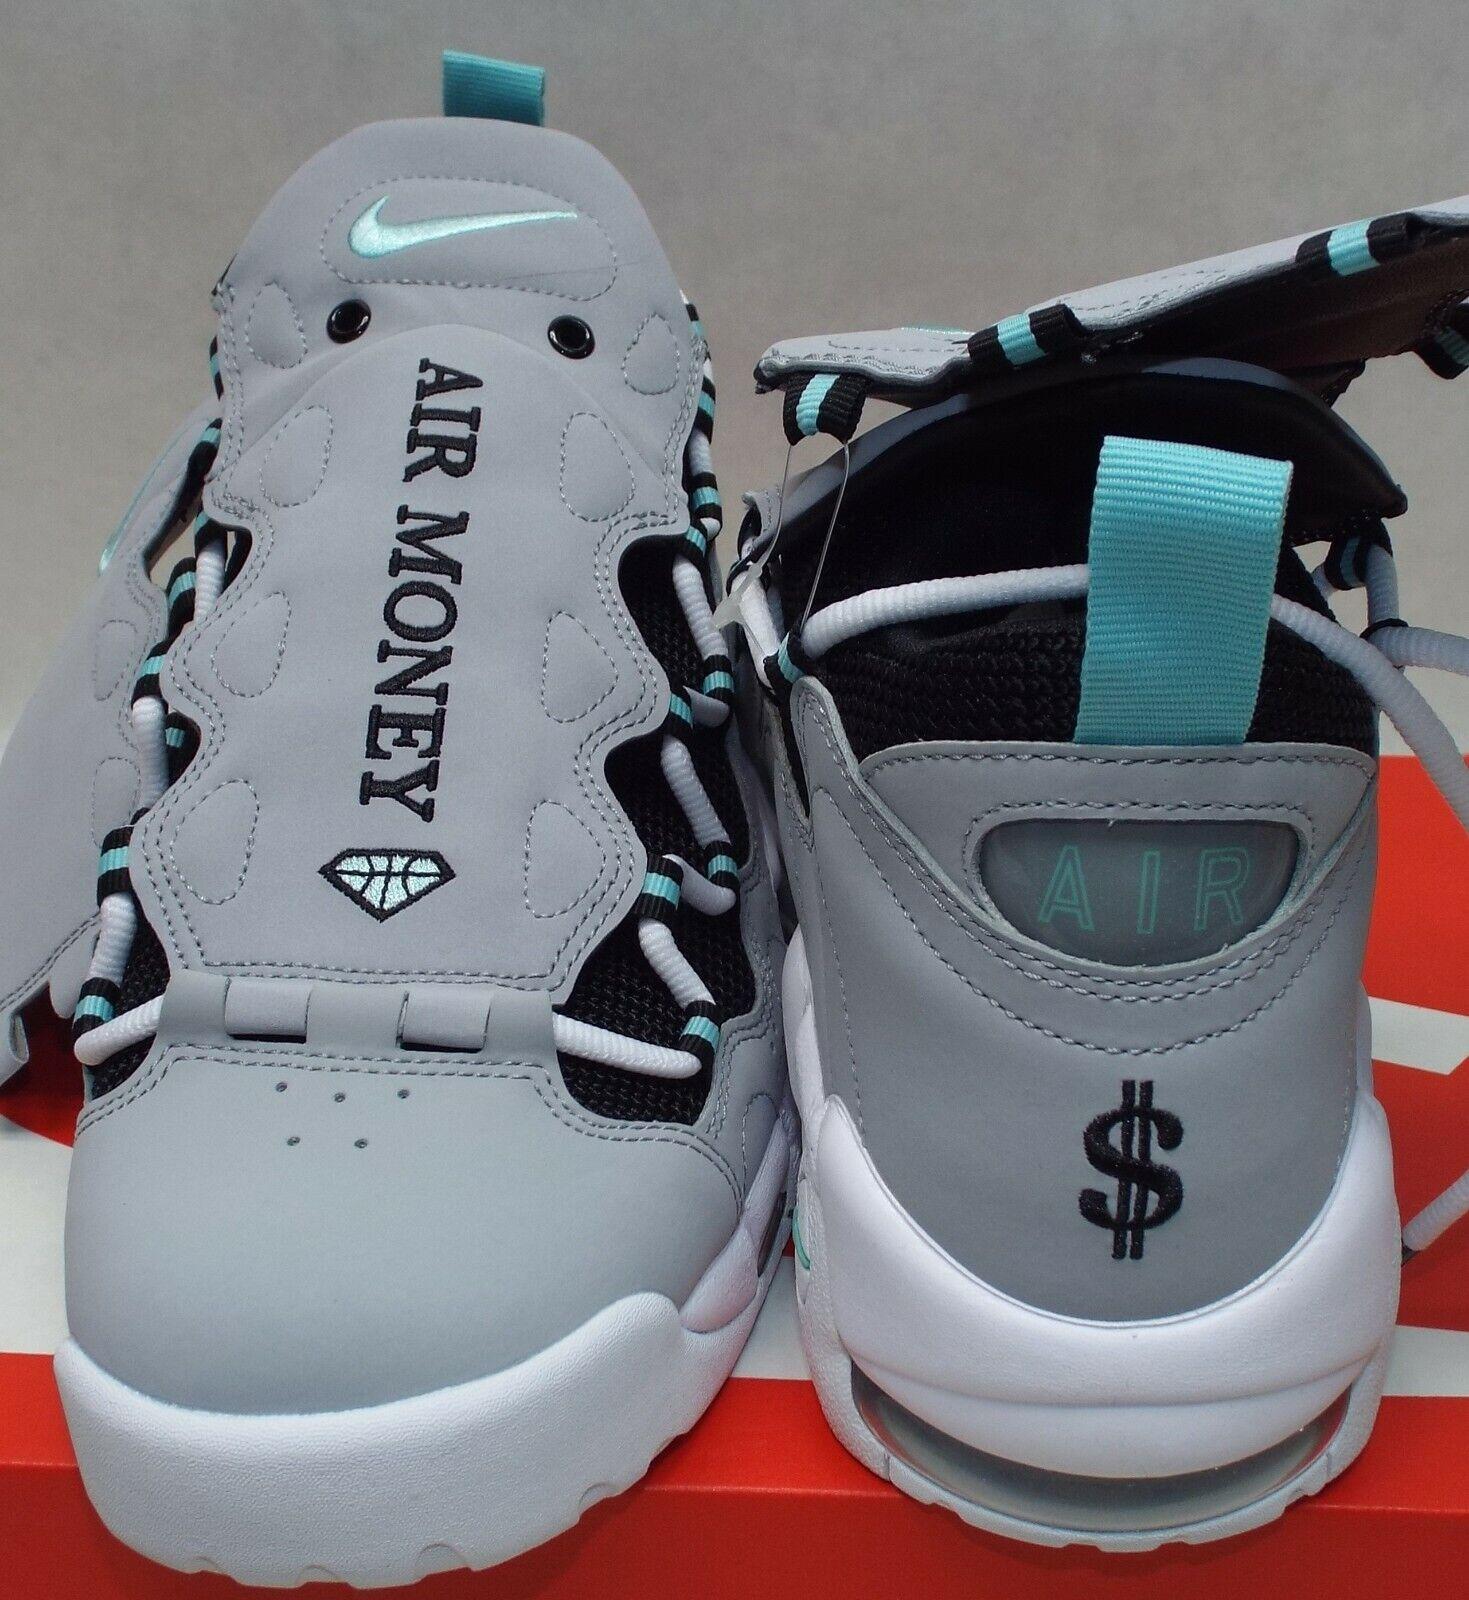 watch fd8f2 6ccee ... New Mens 9 NIKE Air More Money Wolf Grey Island Island Island Leather  shoes 160 AJ2998 ...